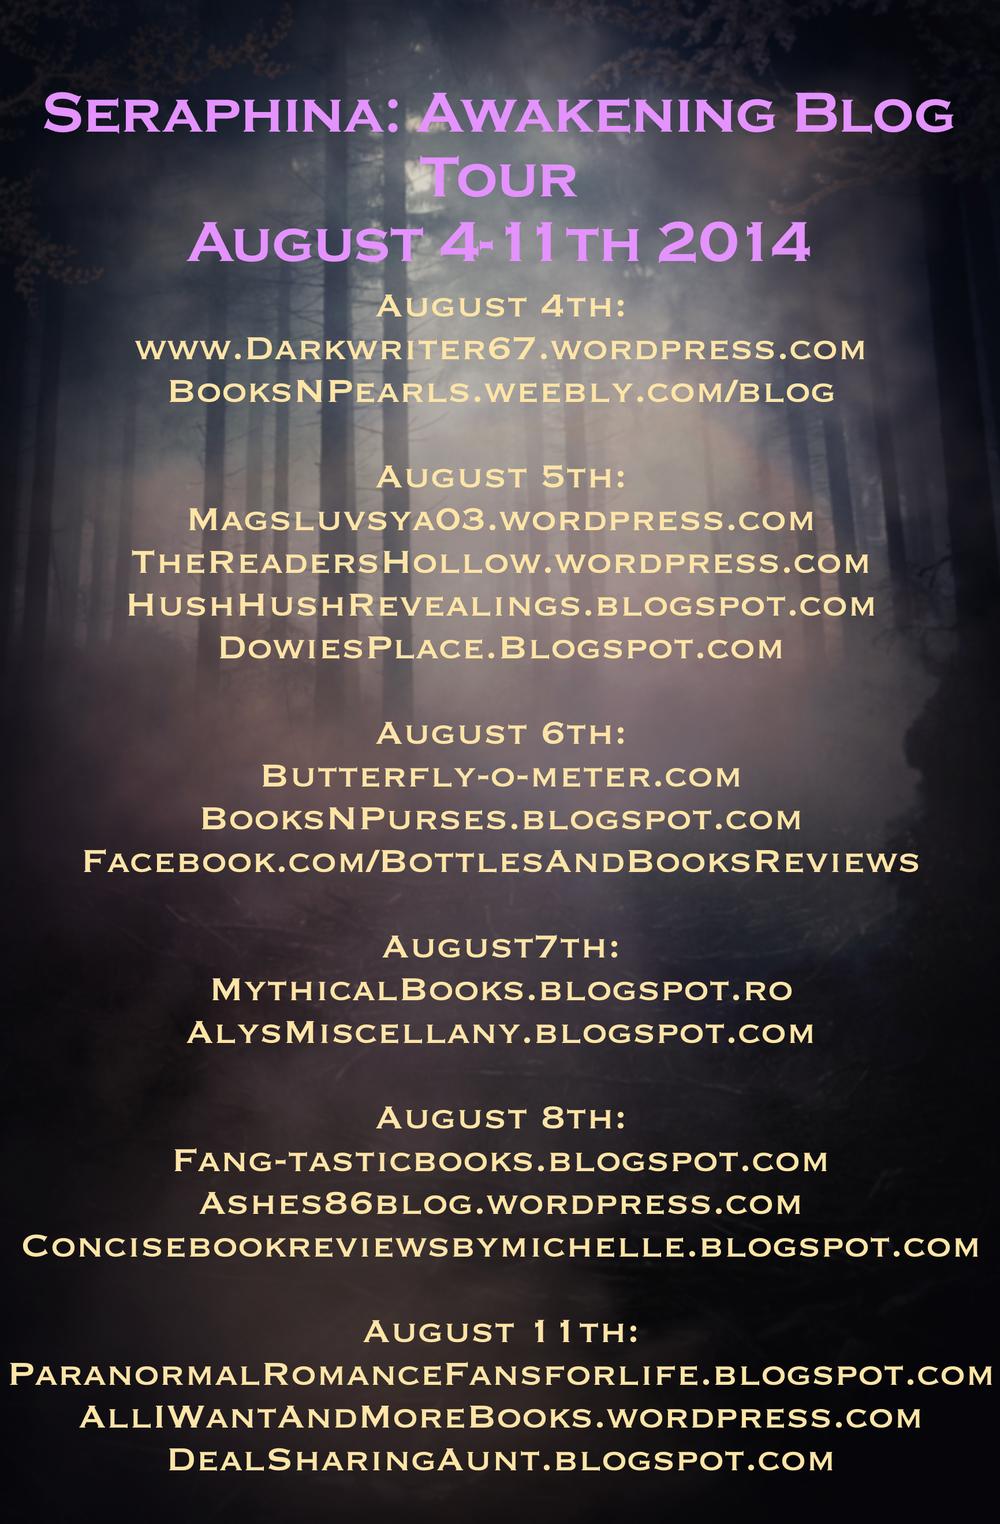 BlogTour2014